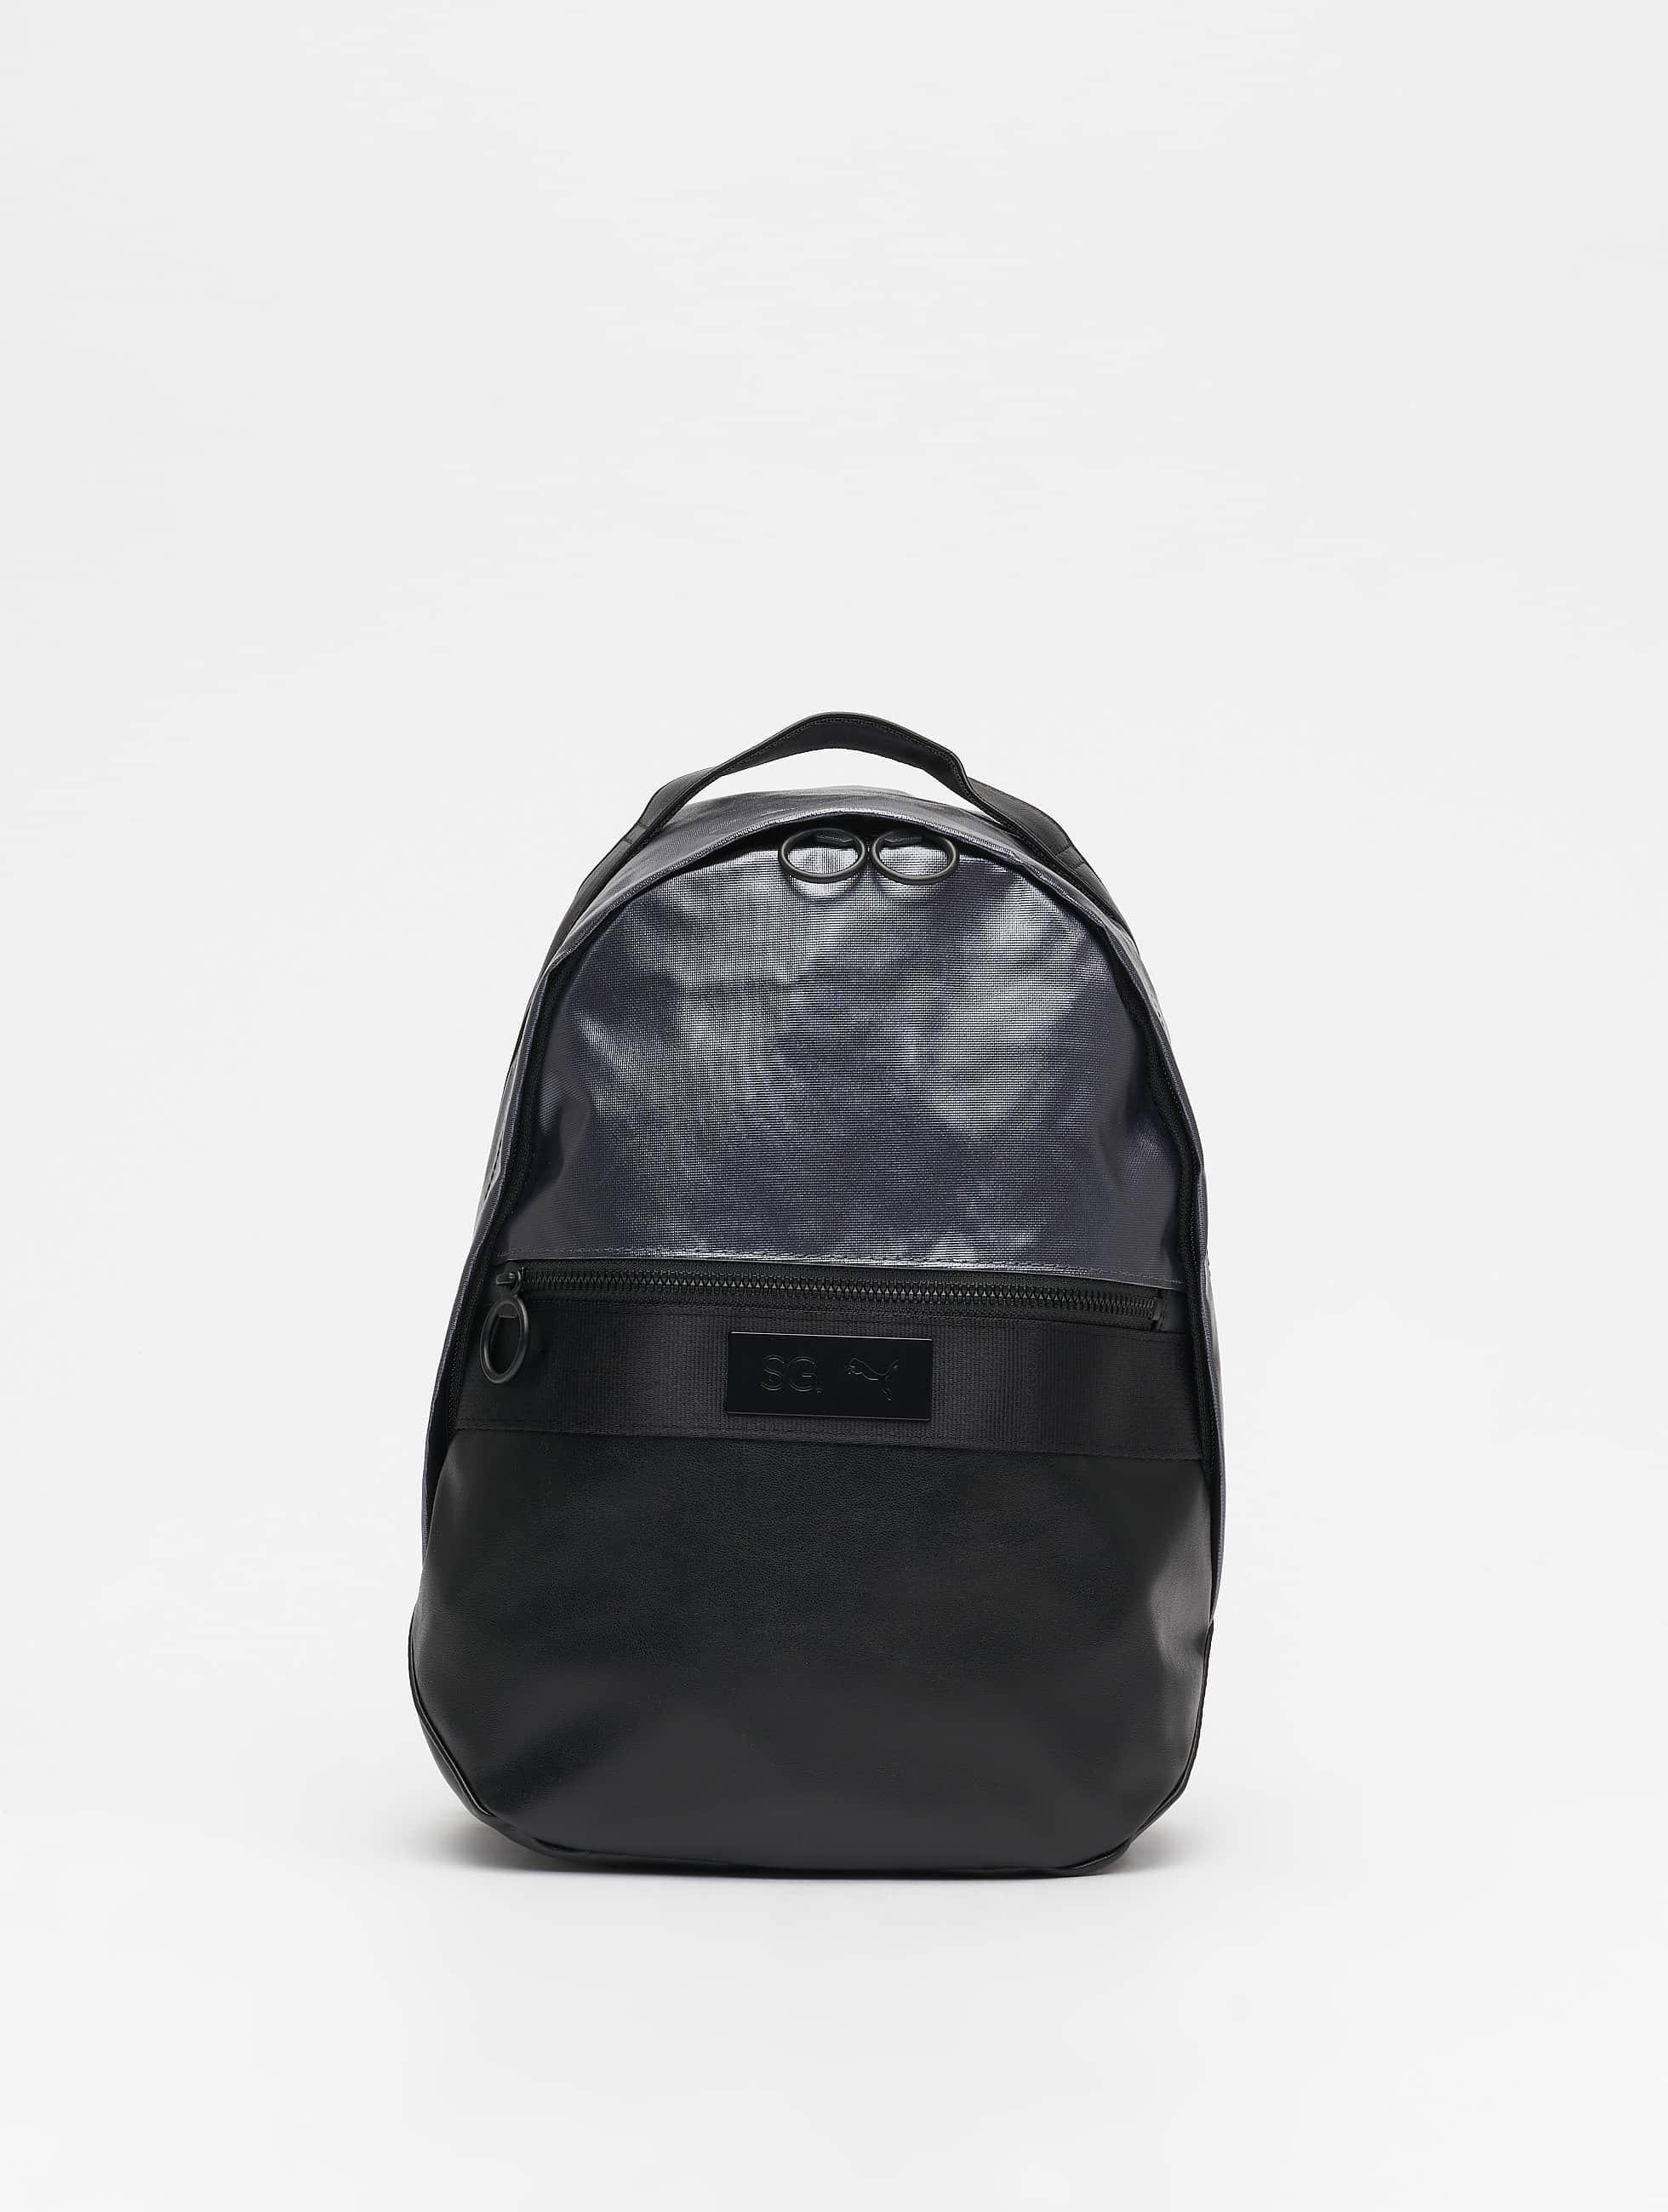 e051ad9db5e Puma Accessoires / rugzak SG X Puma Style in zwart 624400